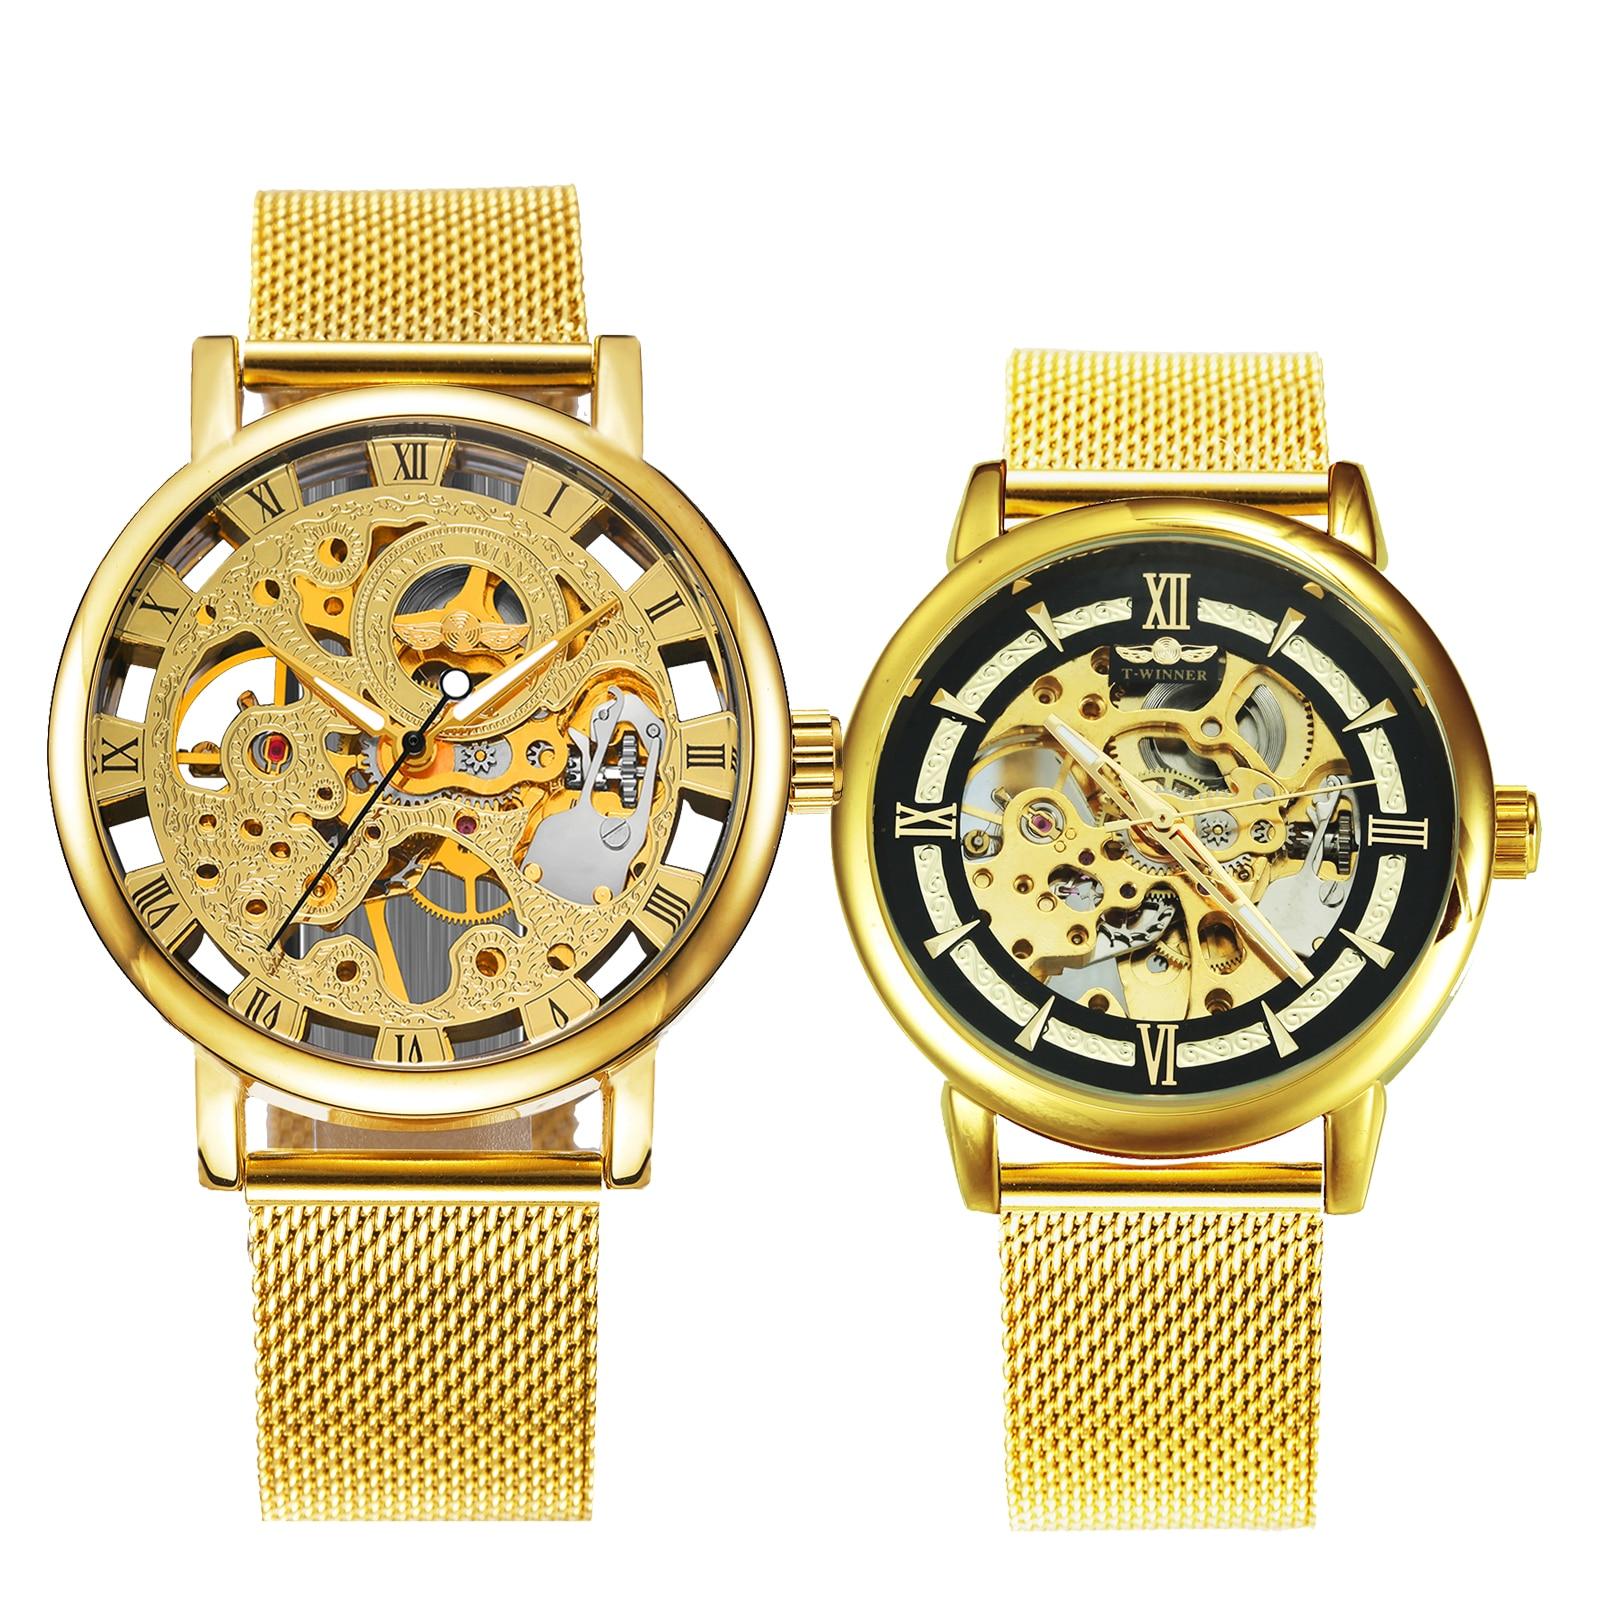 WINNER Official Couple Watch Set Fashion Mechanical Women Watch Men Ultra Thin Mesh Strap Top Brand Luxury Valentine's Day Gift